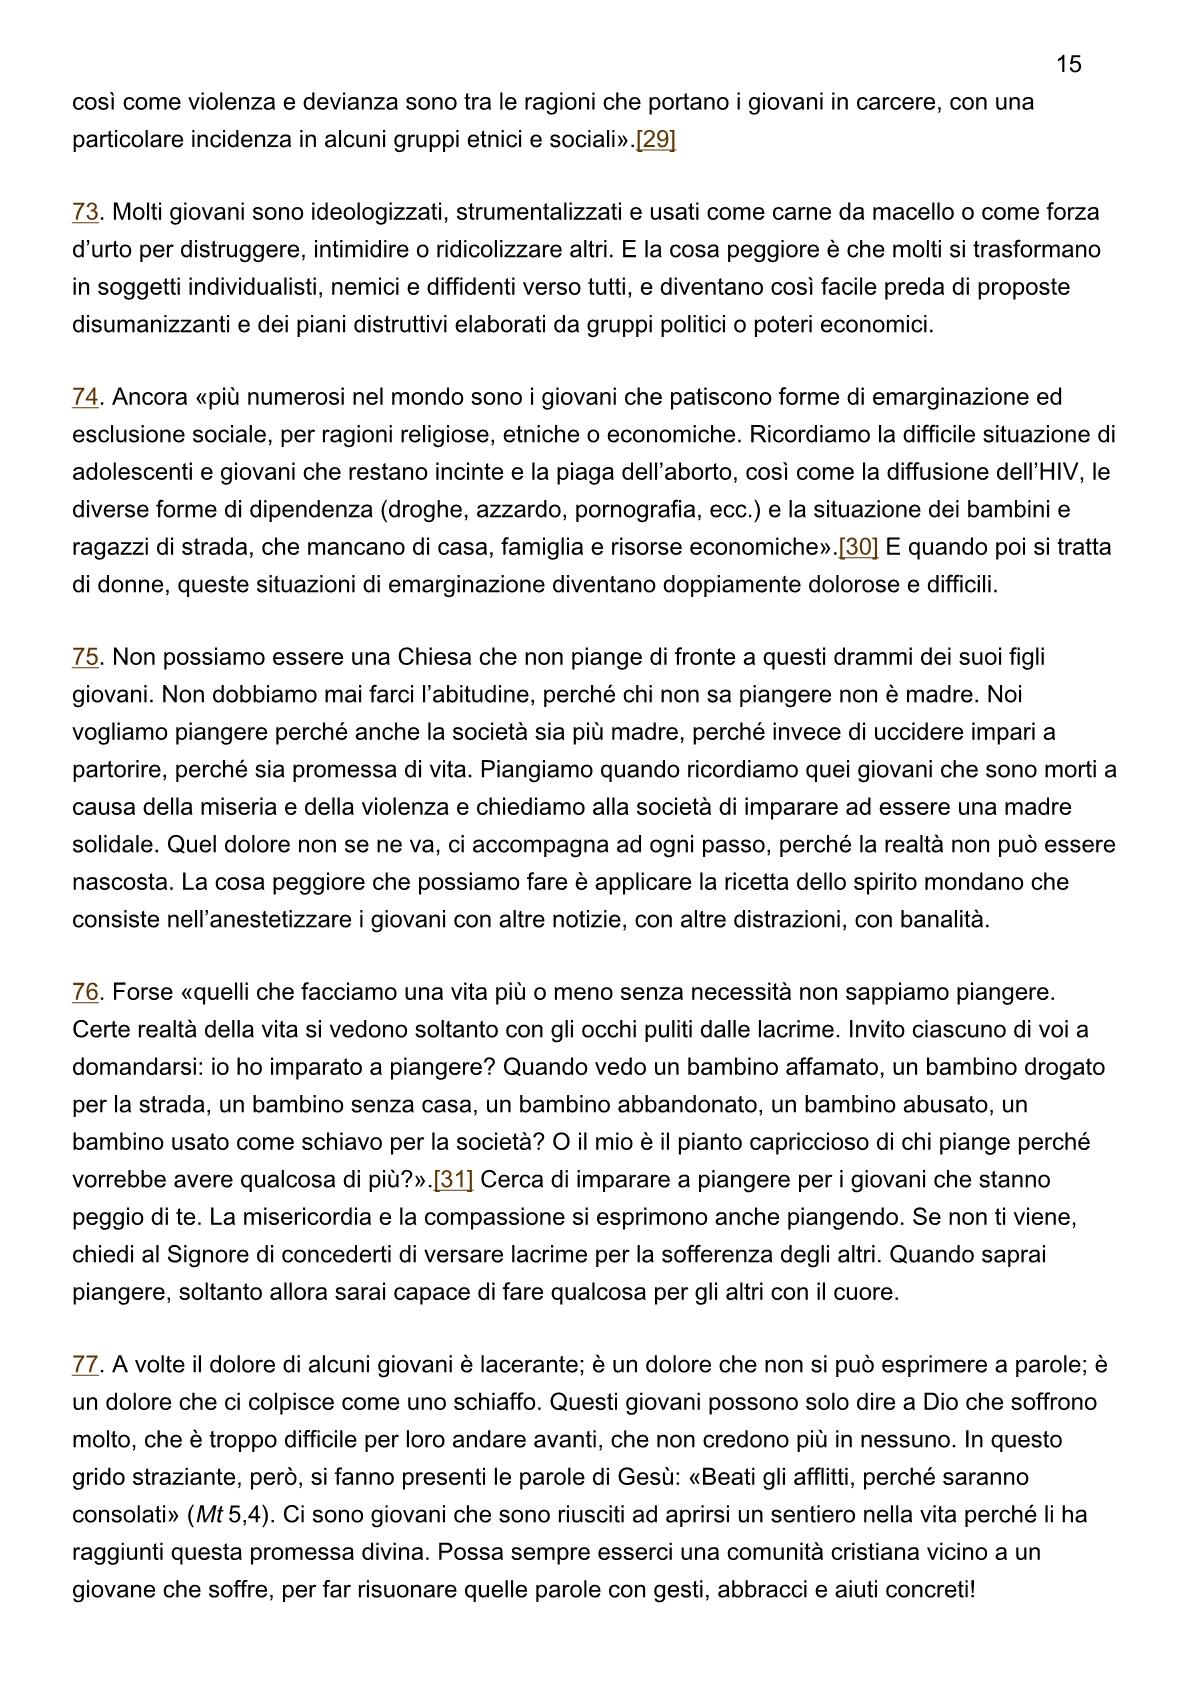 papa-francesco_esortazione-ap_20190325_christus-vivit15